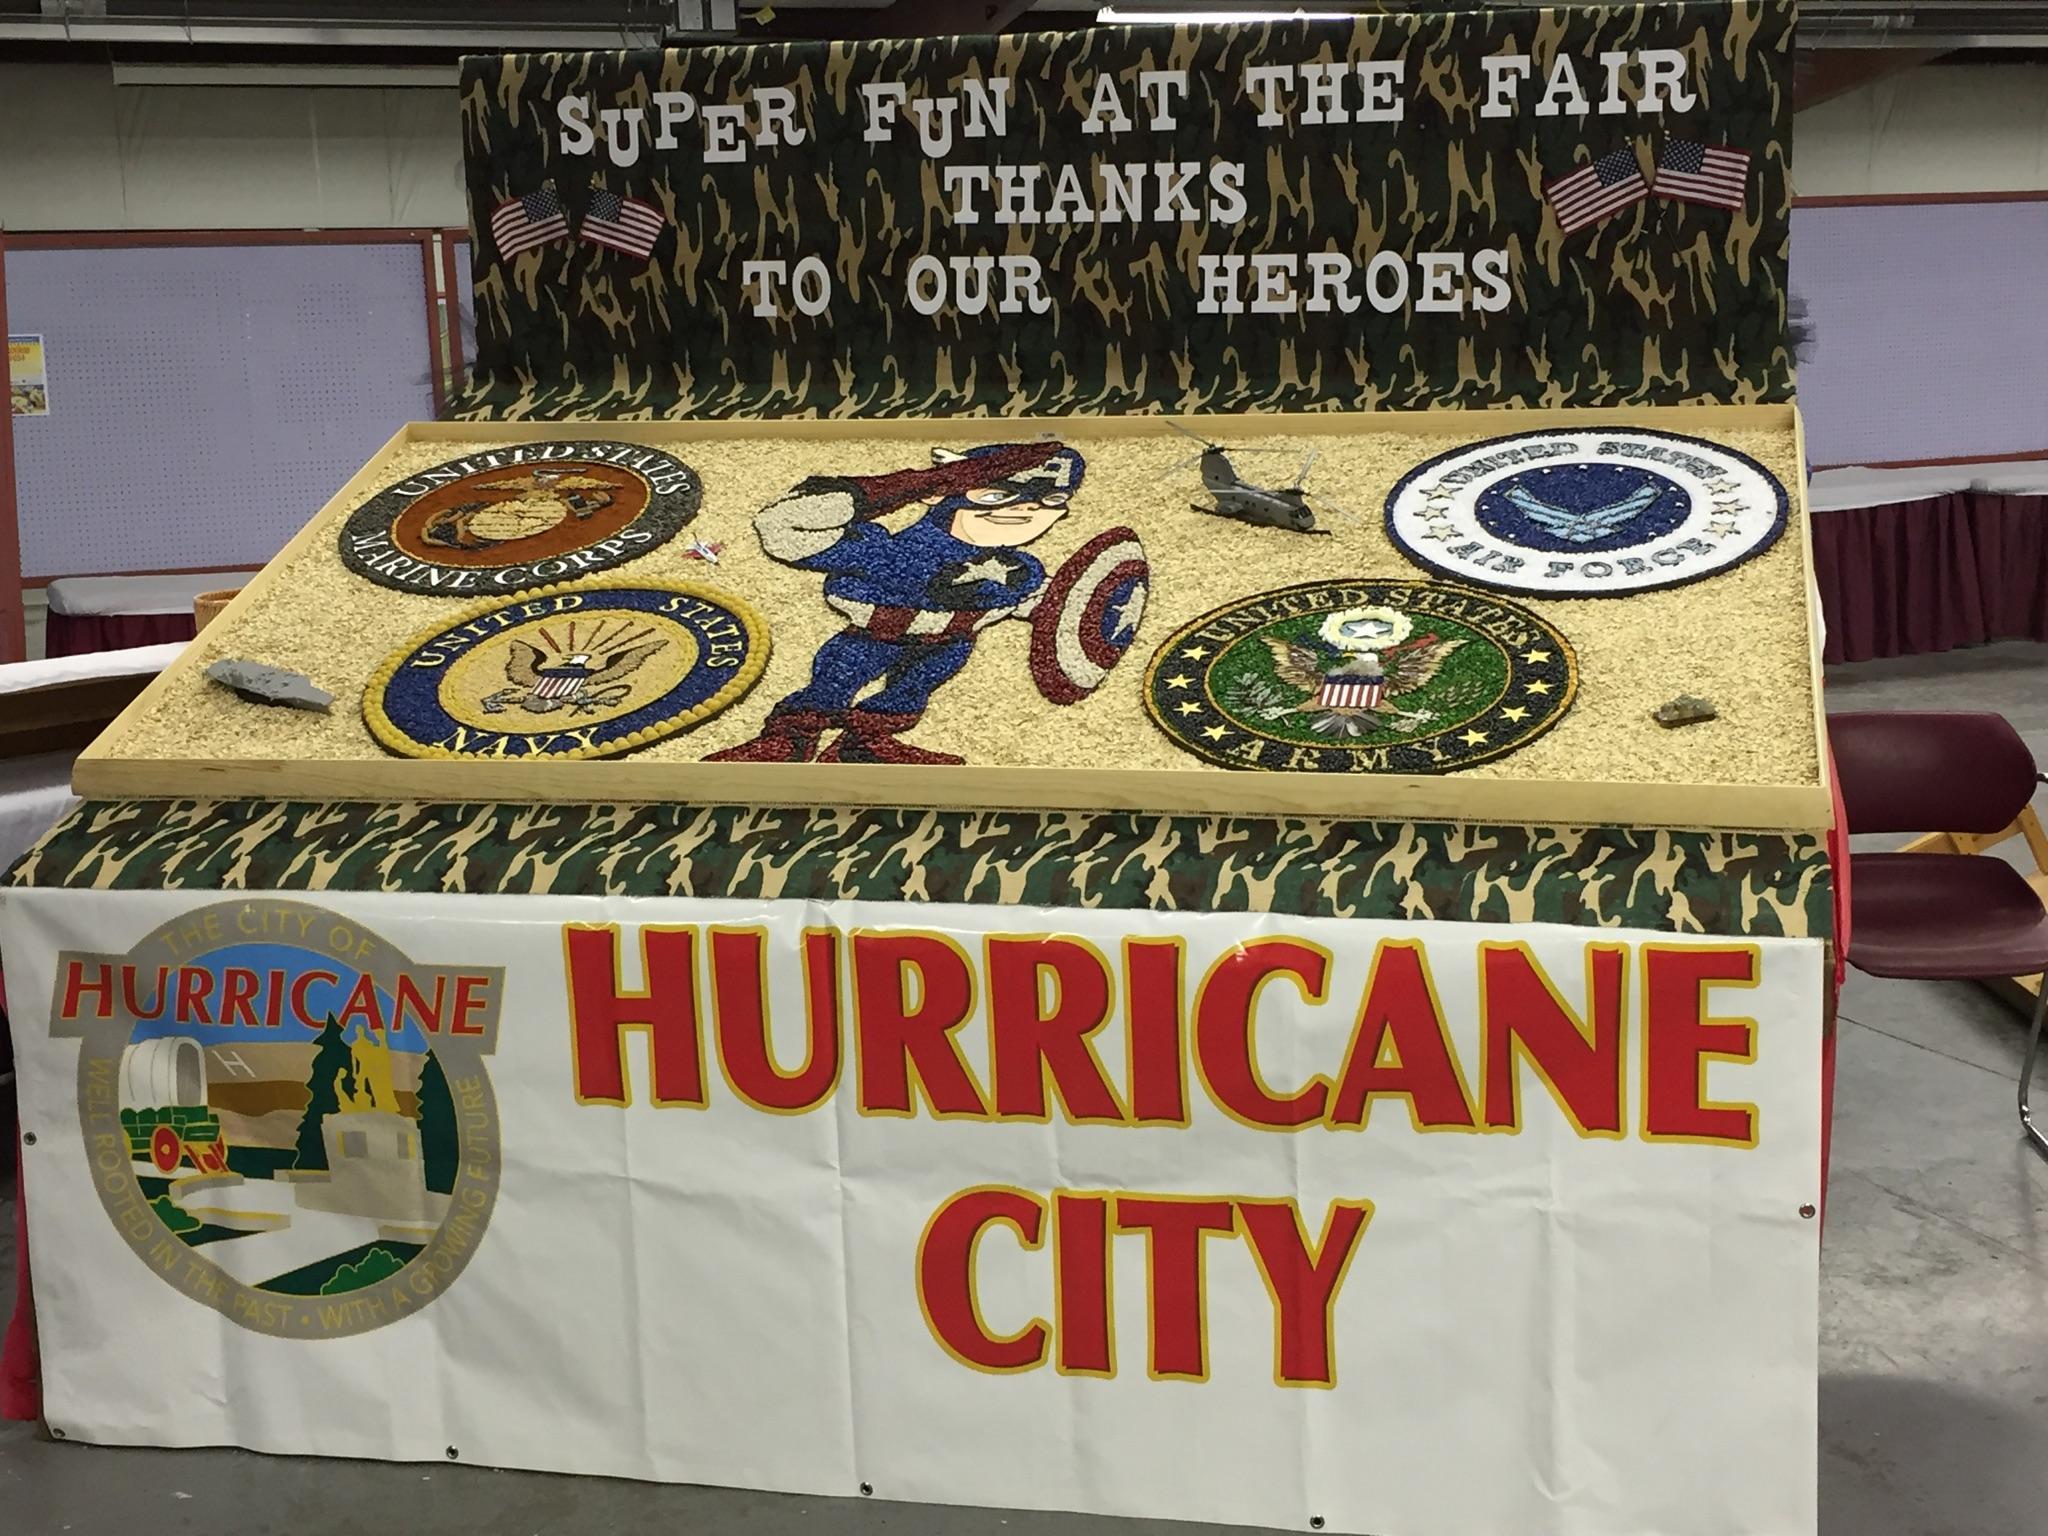 Hurricane City's award winning seed display, circa July-September 2015 | Photo courtesy of Matt Patterson, assistant Hurricane City recreation director, St. George News